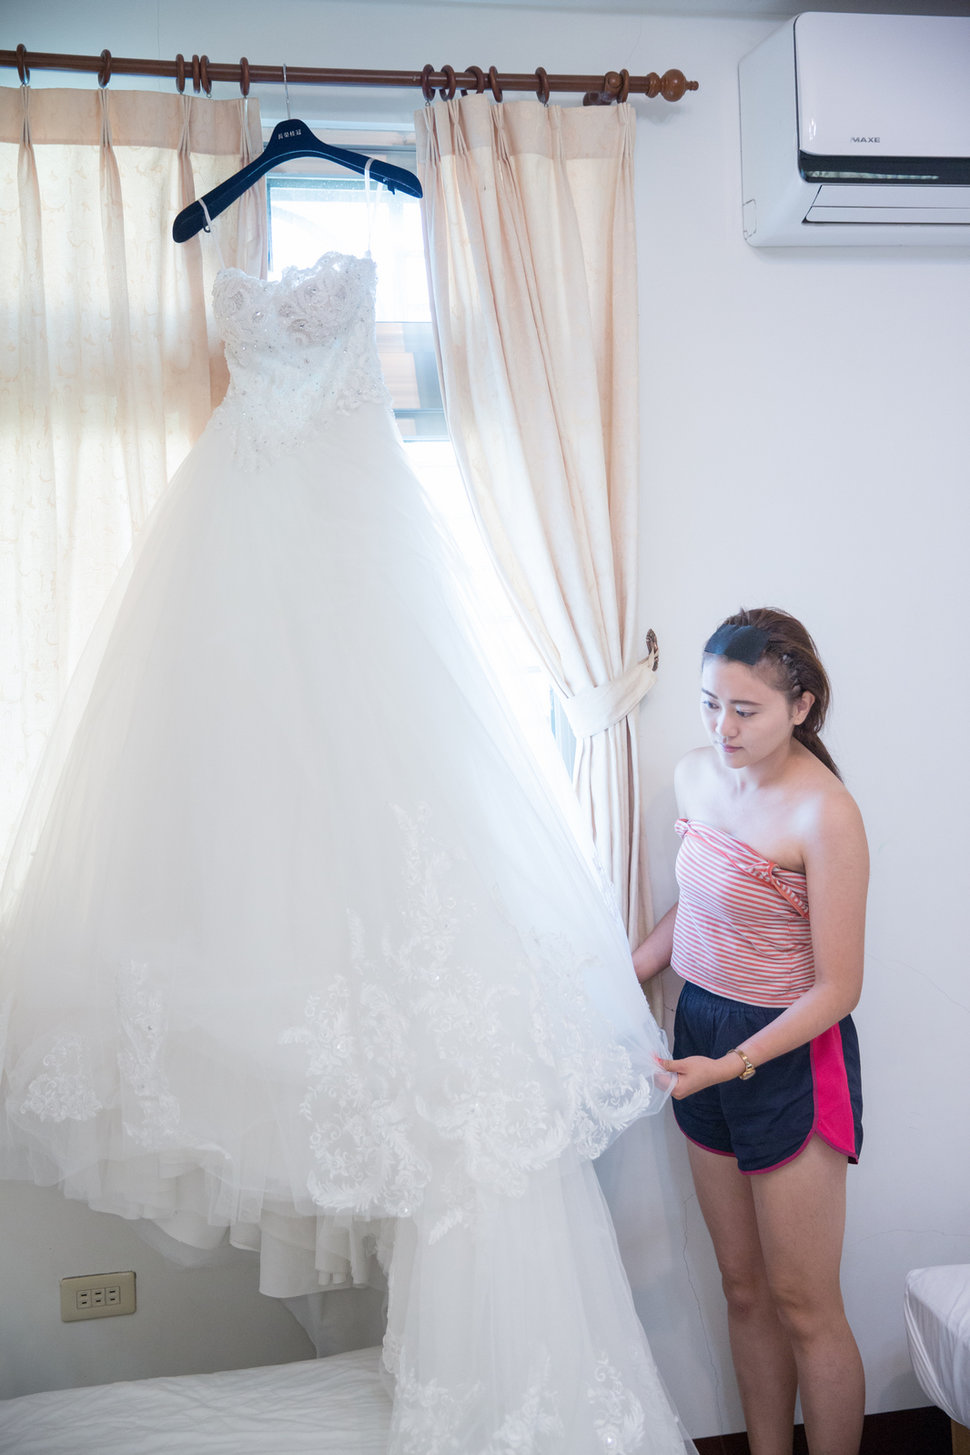 HANK8269 - 蛋拔婚禮攝影《結婚吧》